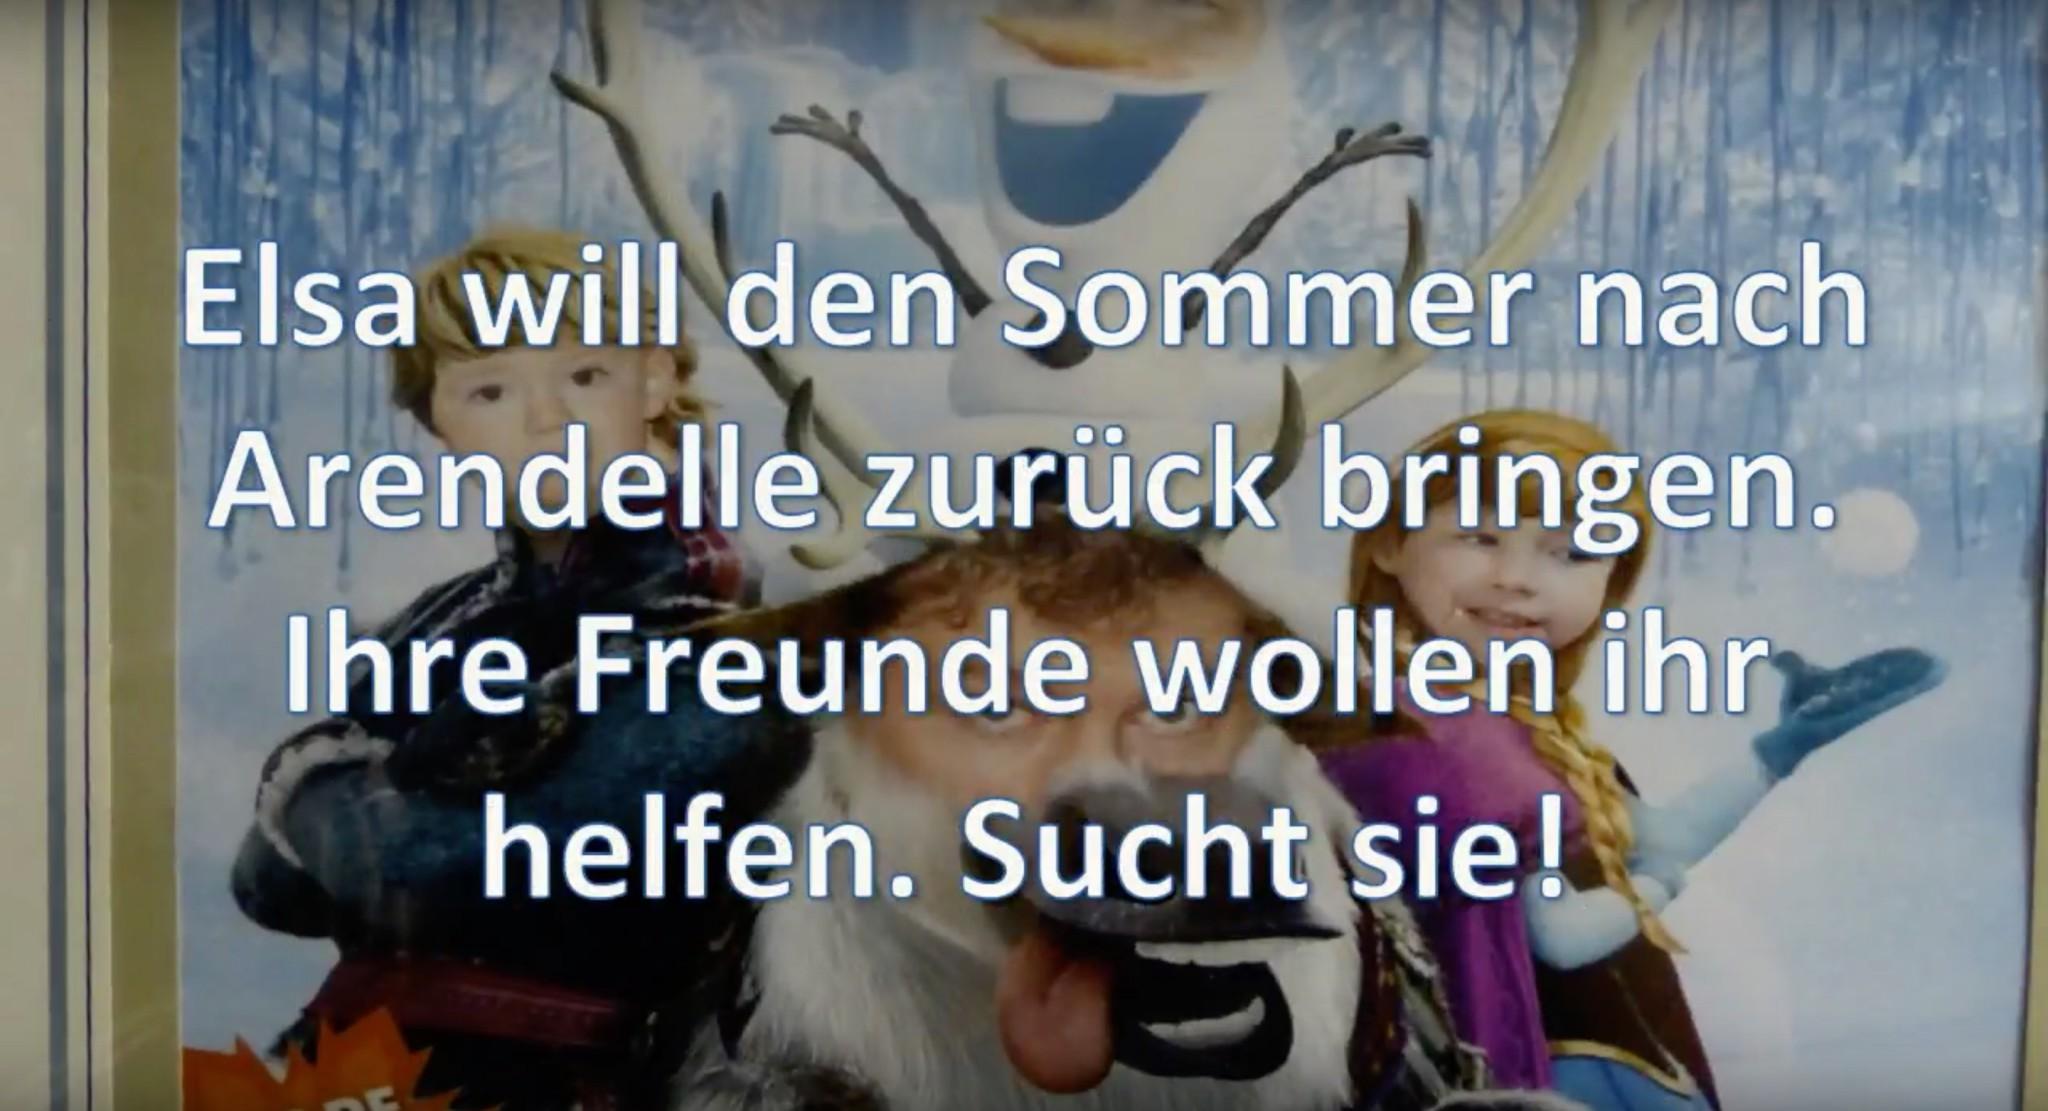 Schnitzeljagd à la Eiskönigin